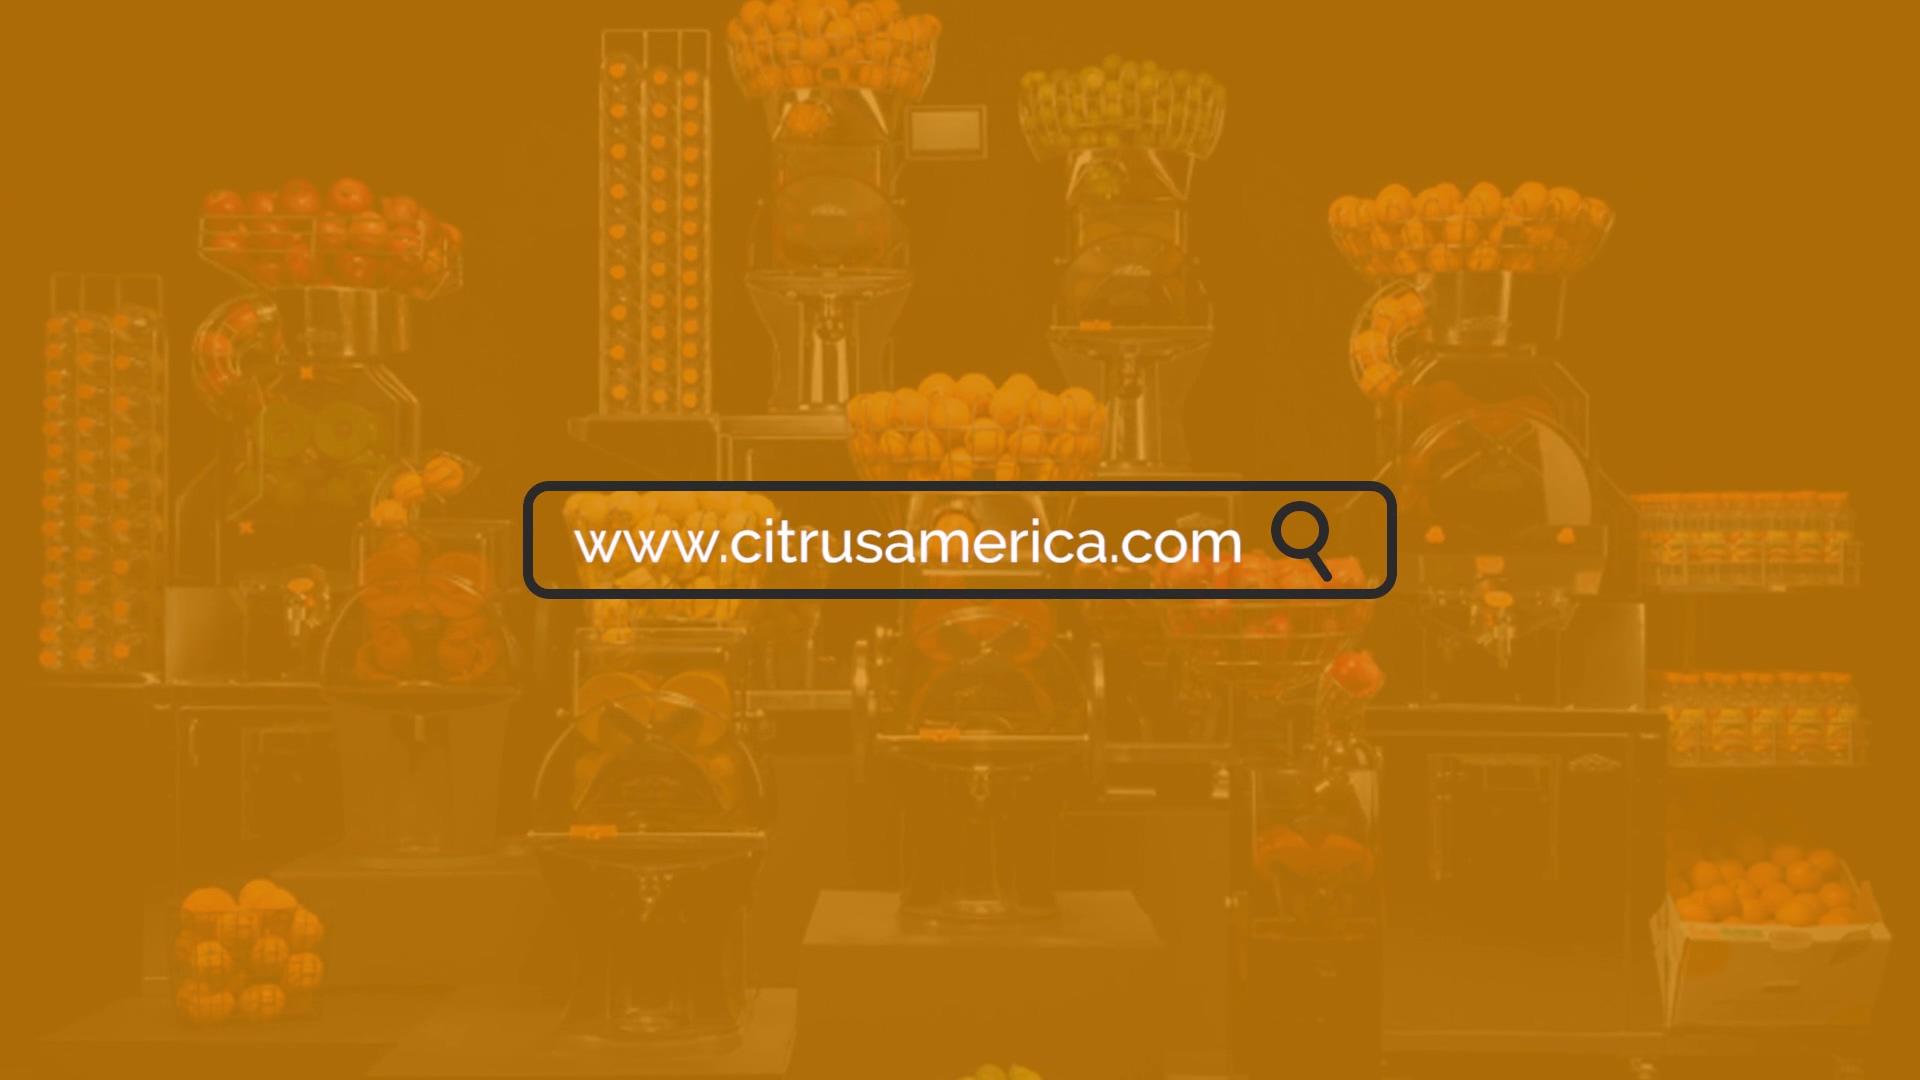 citrus america teaser updated